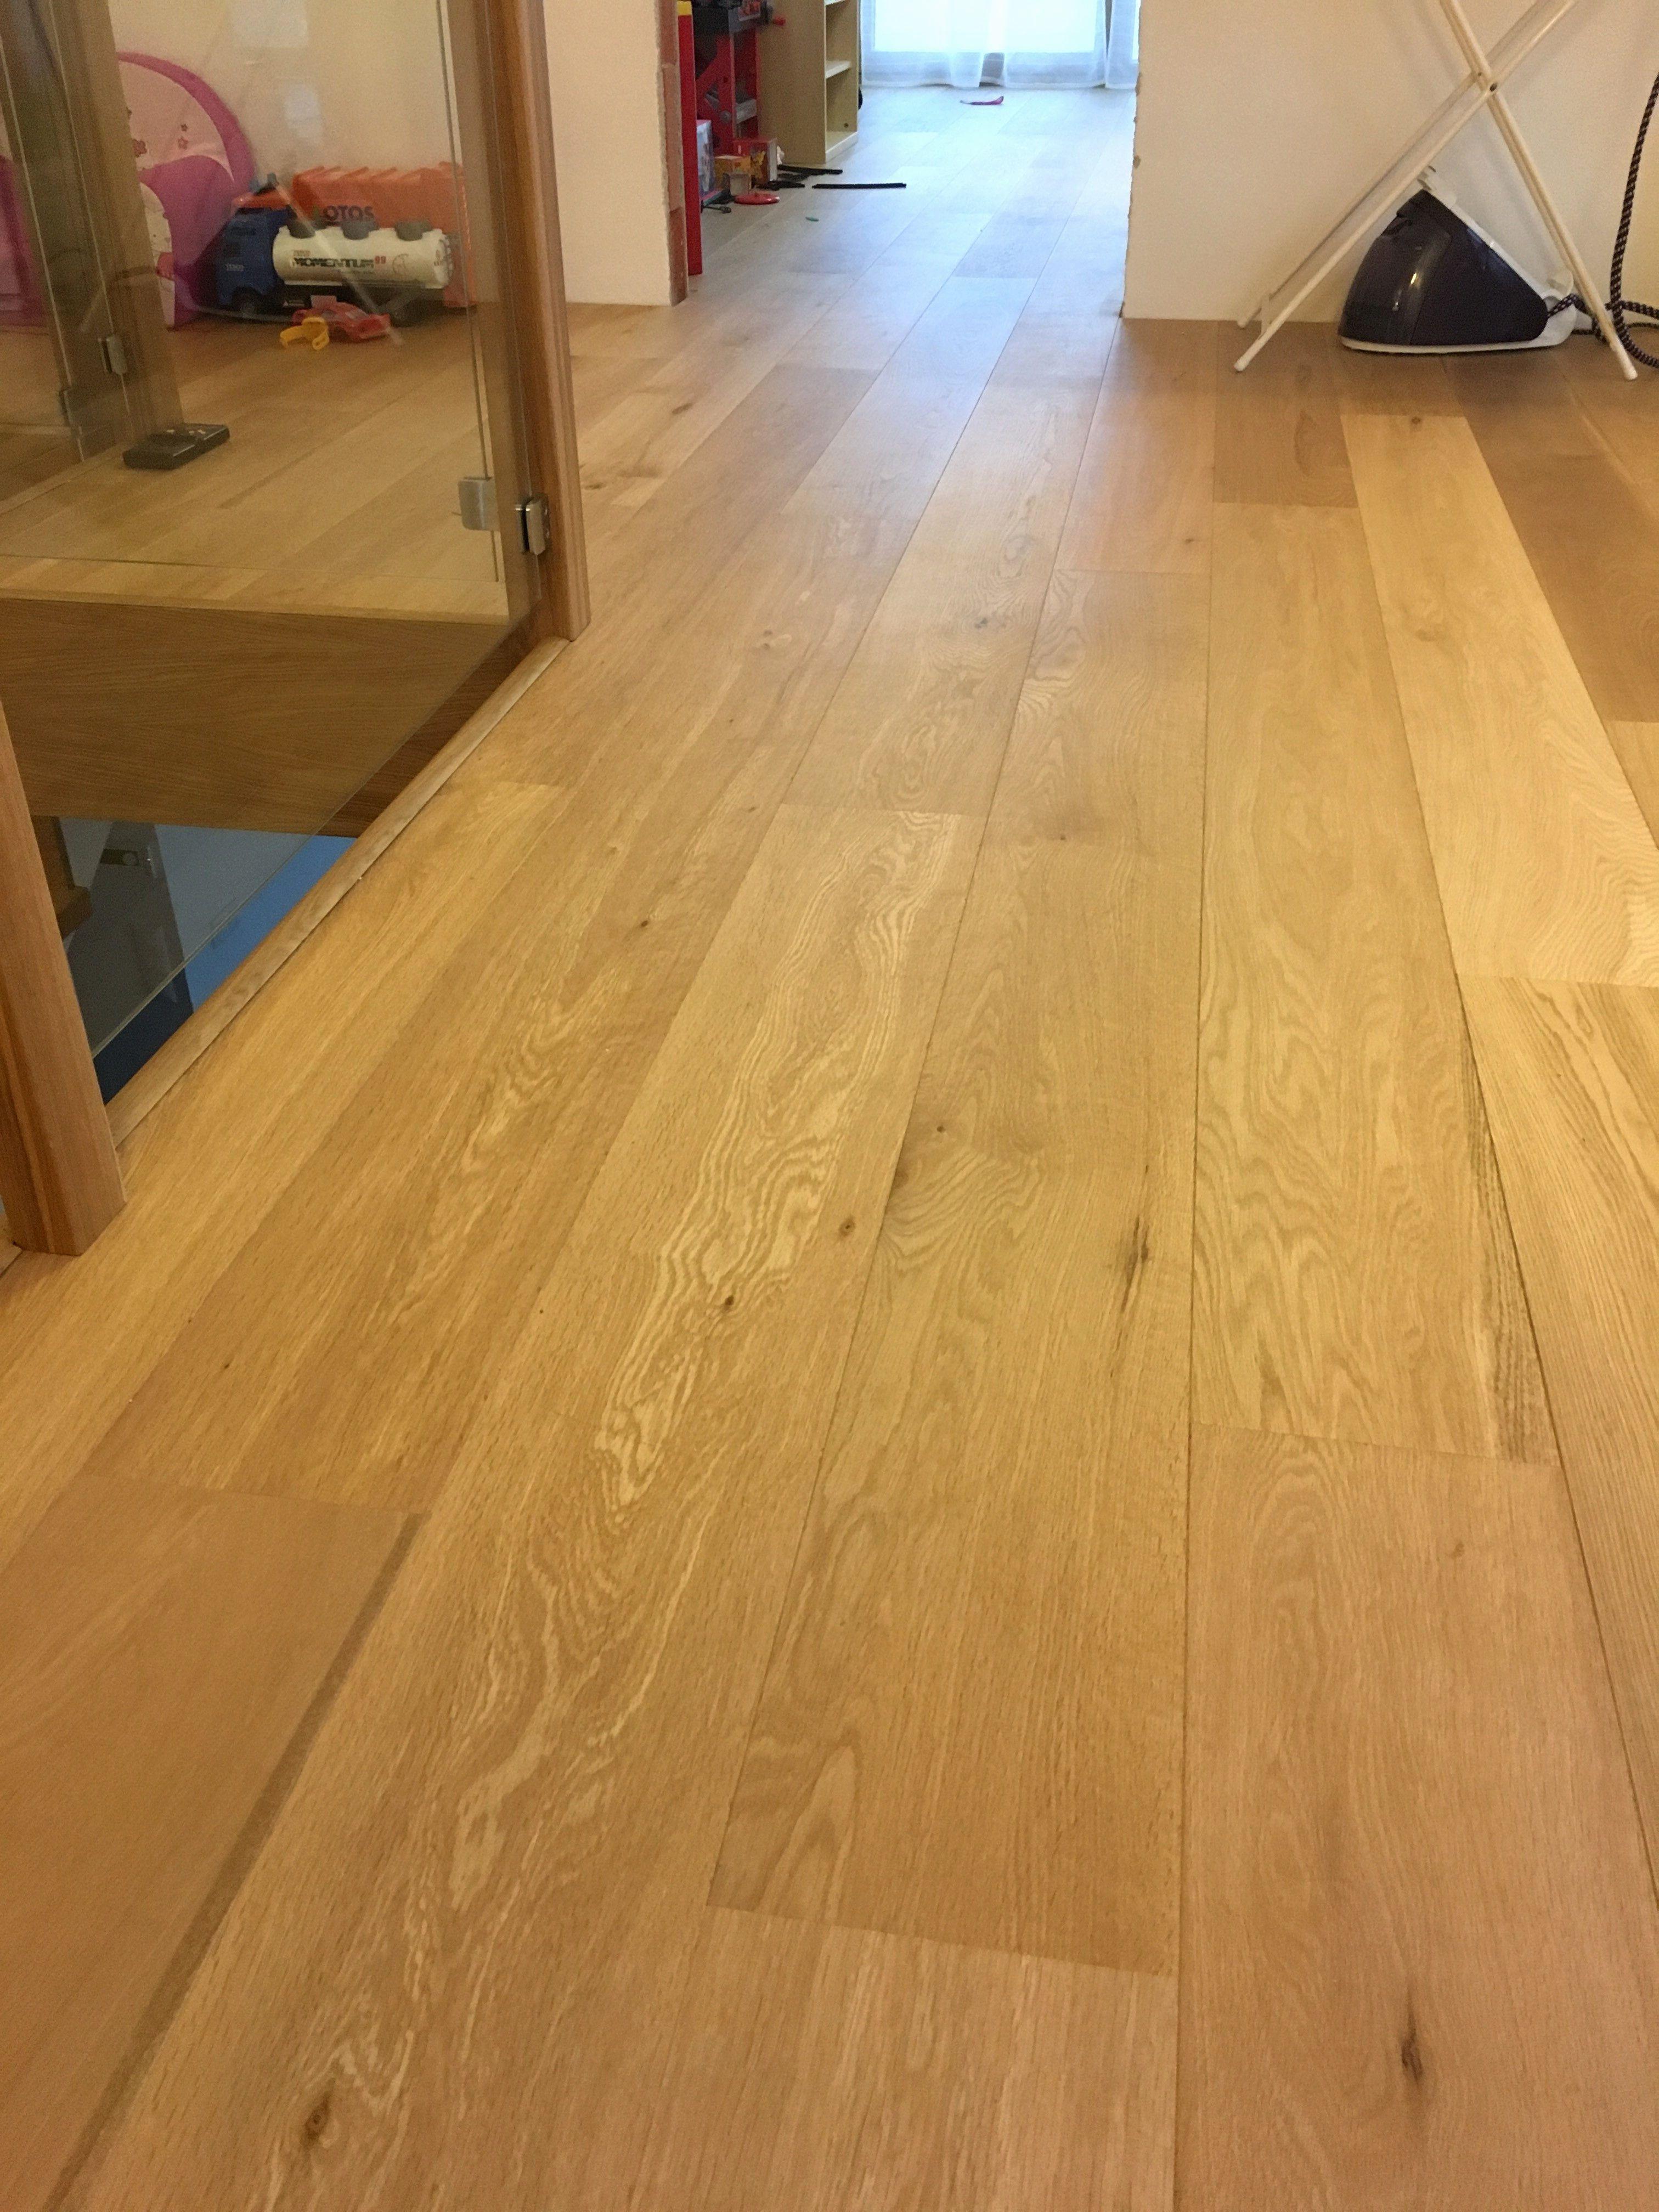 mohawk hardwood floor cleaner of laminate floor cleaner floor plan ideas throughout hardwood flooring vs laminate beautiful naturalny dub od belgickaho va½robcu lamett hardwood flooring vs laminate